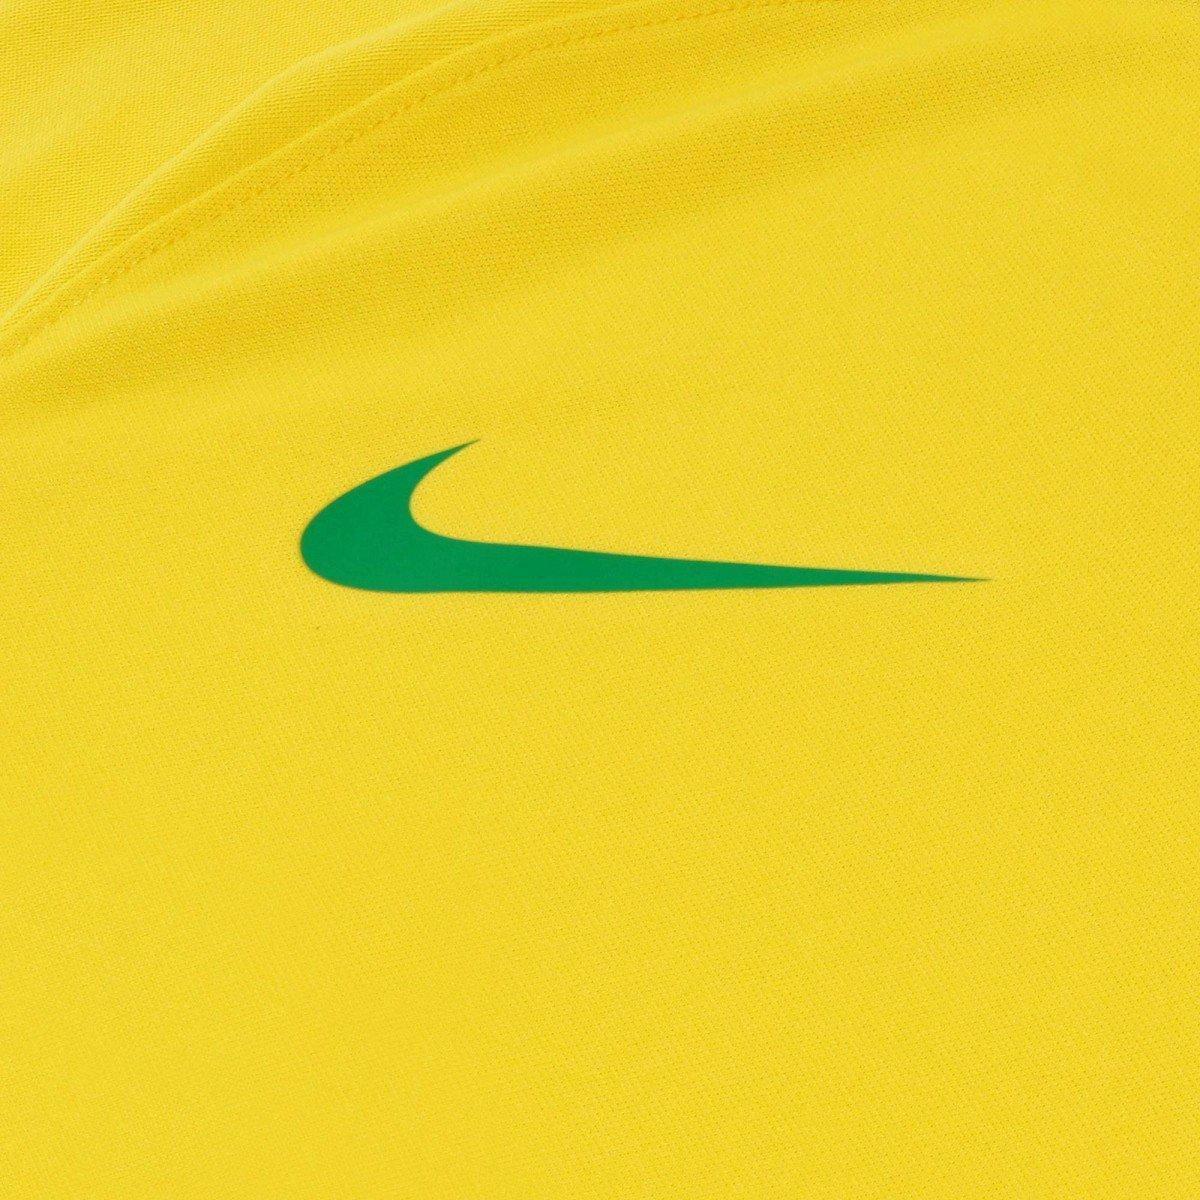 Camisa Nike Brasil I 2018 19 Torcedor Estádio Masculina - Compre ... 50921663e13d9